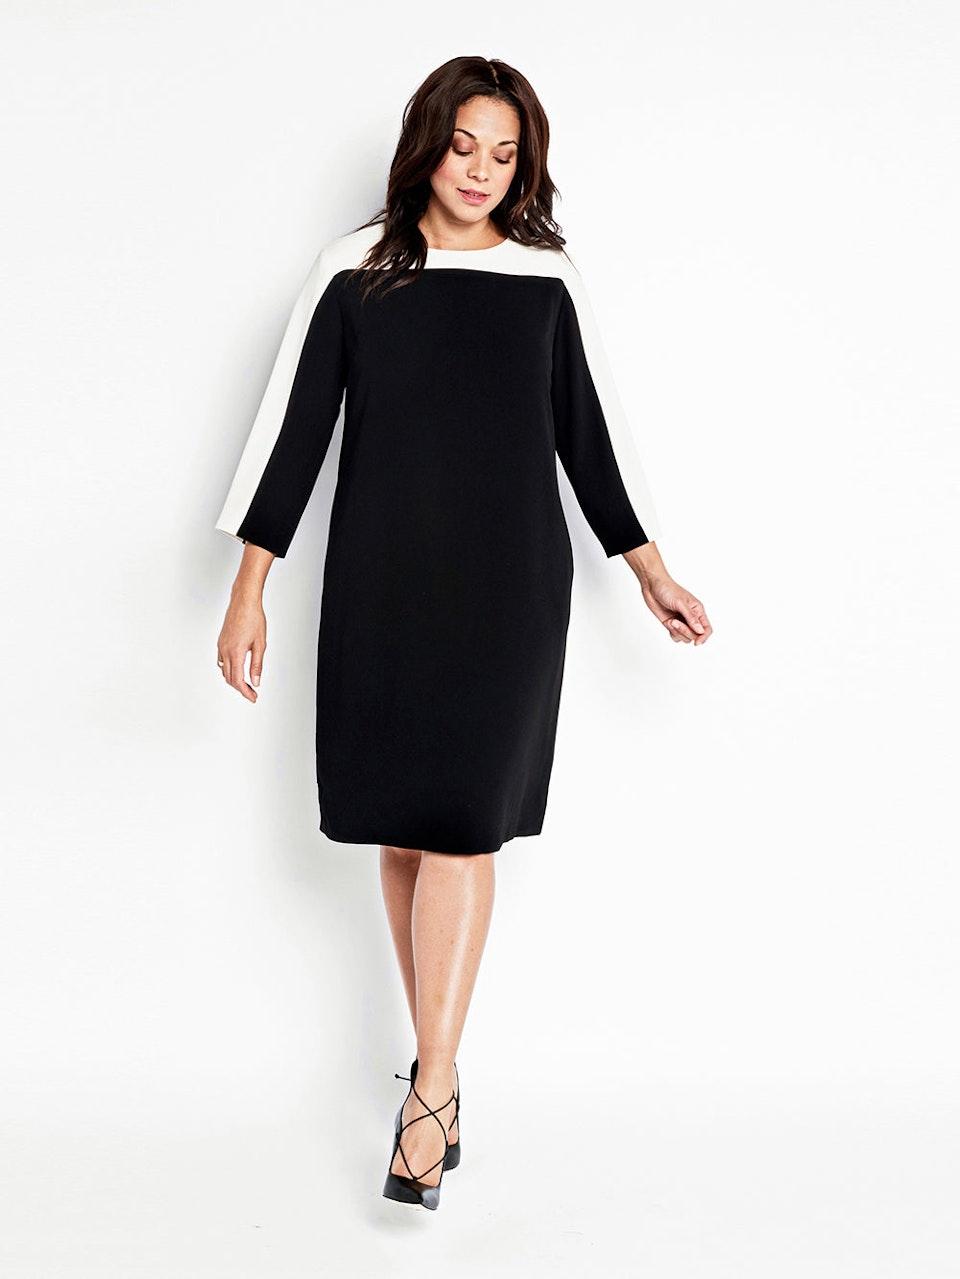 Stanton Dress